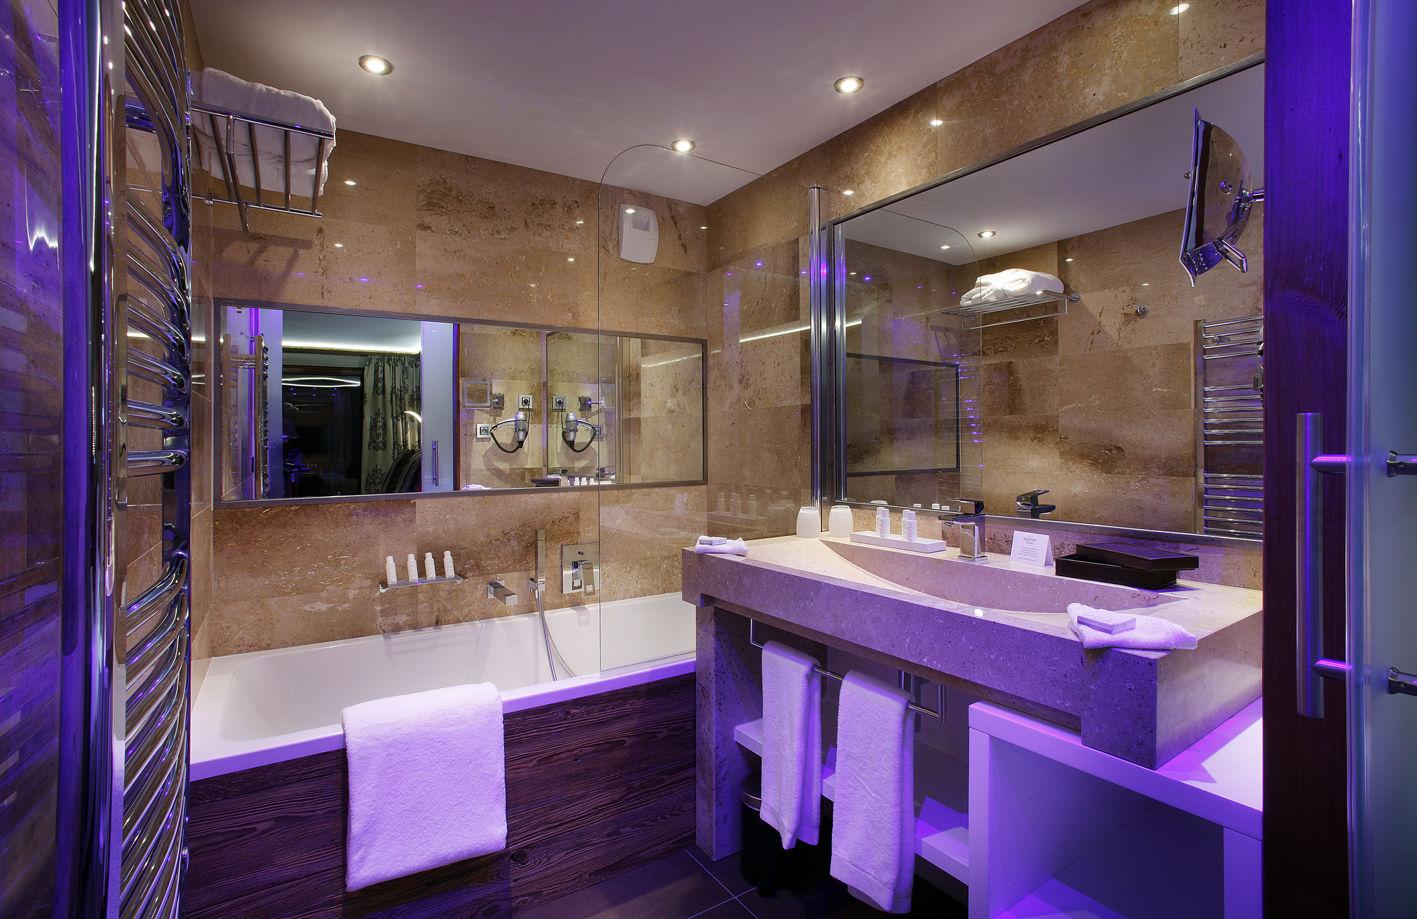 duo-room-26-m%c2%b2-bathroom